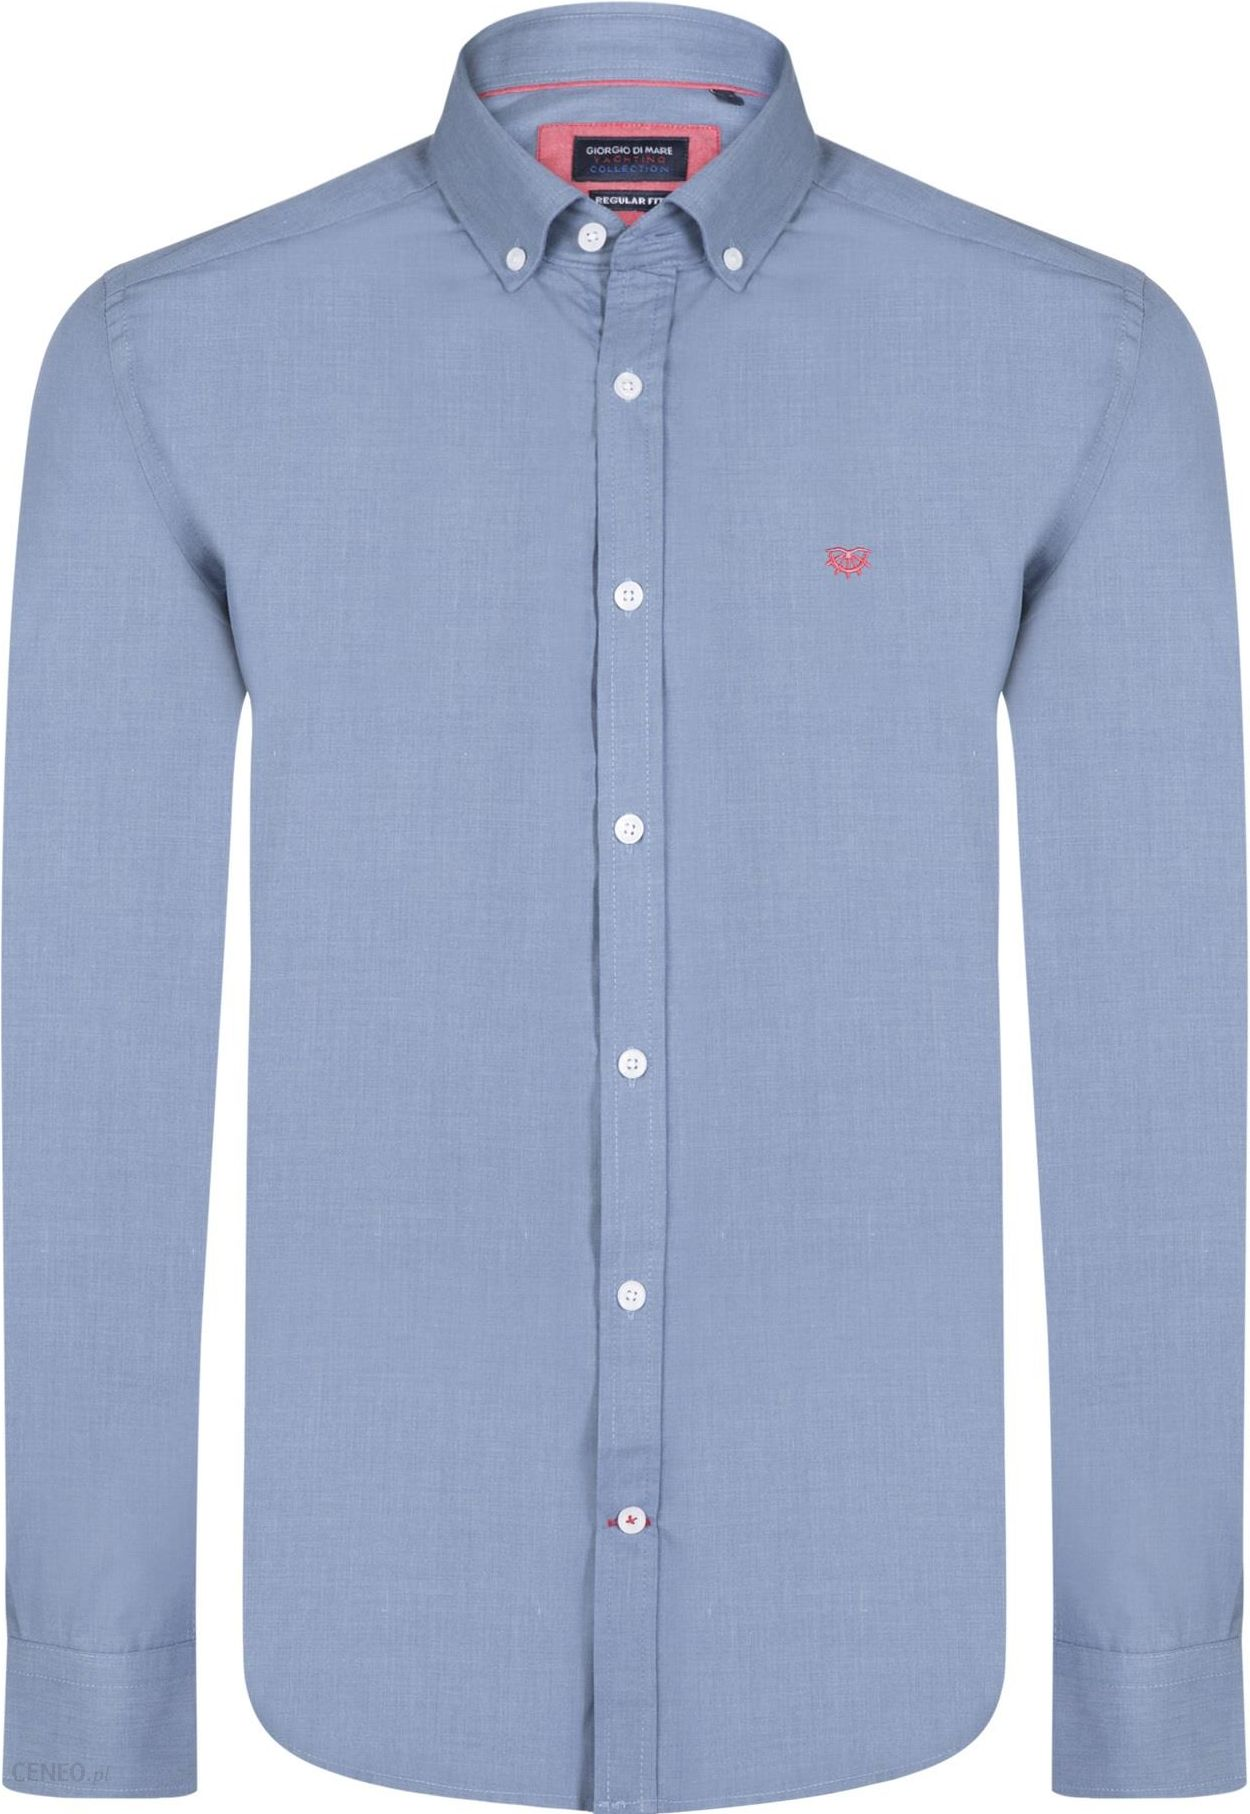 e730030e75ab Giorgio Di Mare koszula męska GI496334 L jasnoniebieski - Ceny i ...